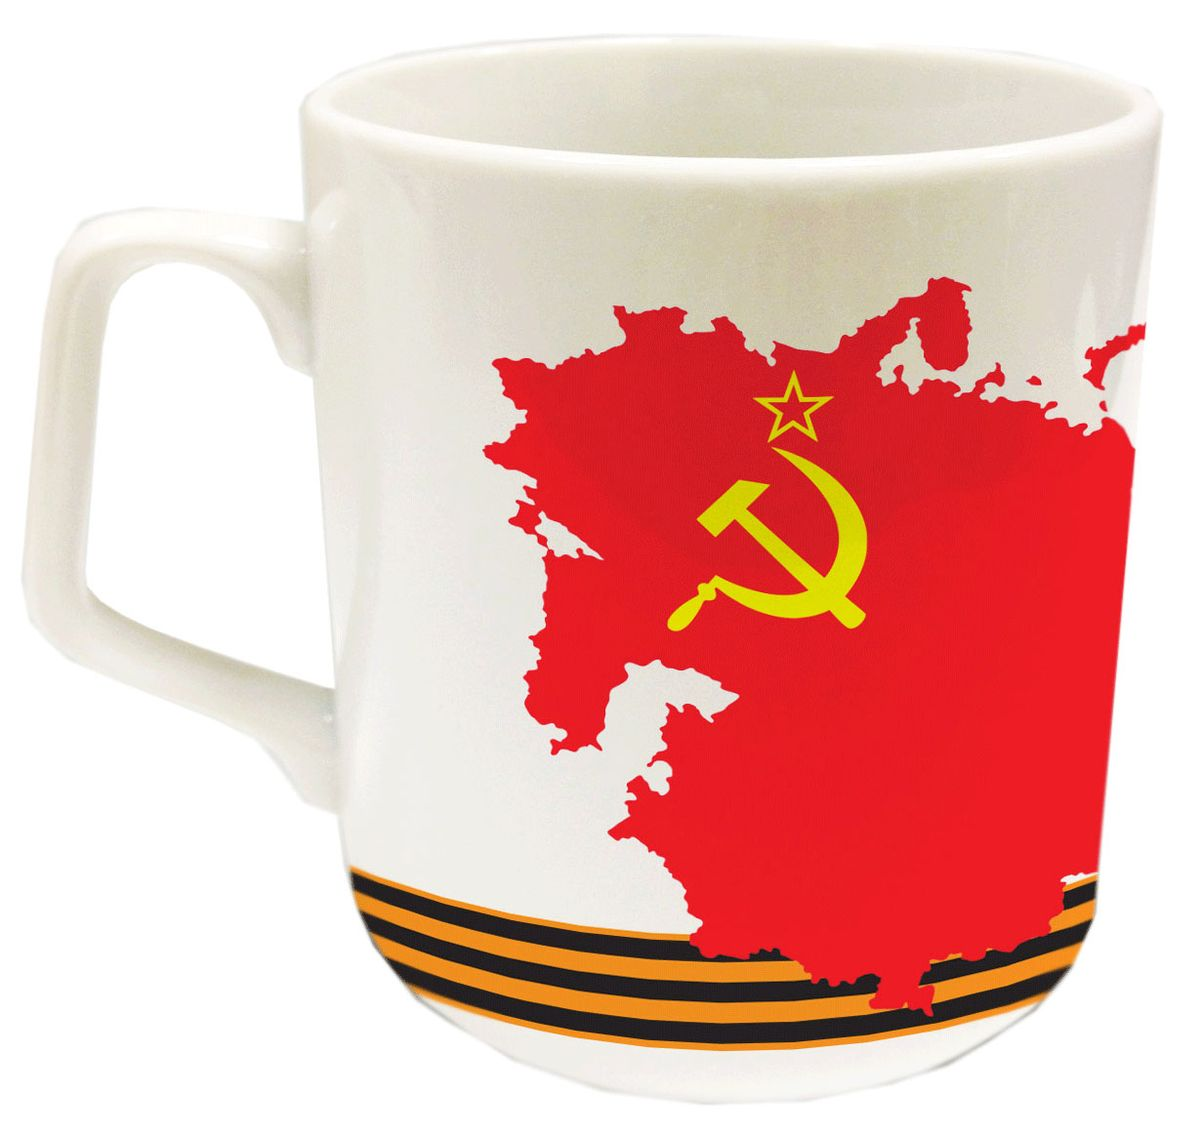 Кружка PrioritY Советская серия. Карта, 350 мл кружка gift n home парижские цветы 350 мл